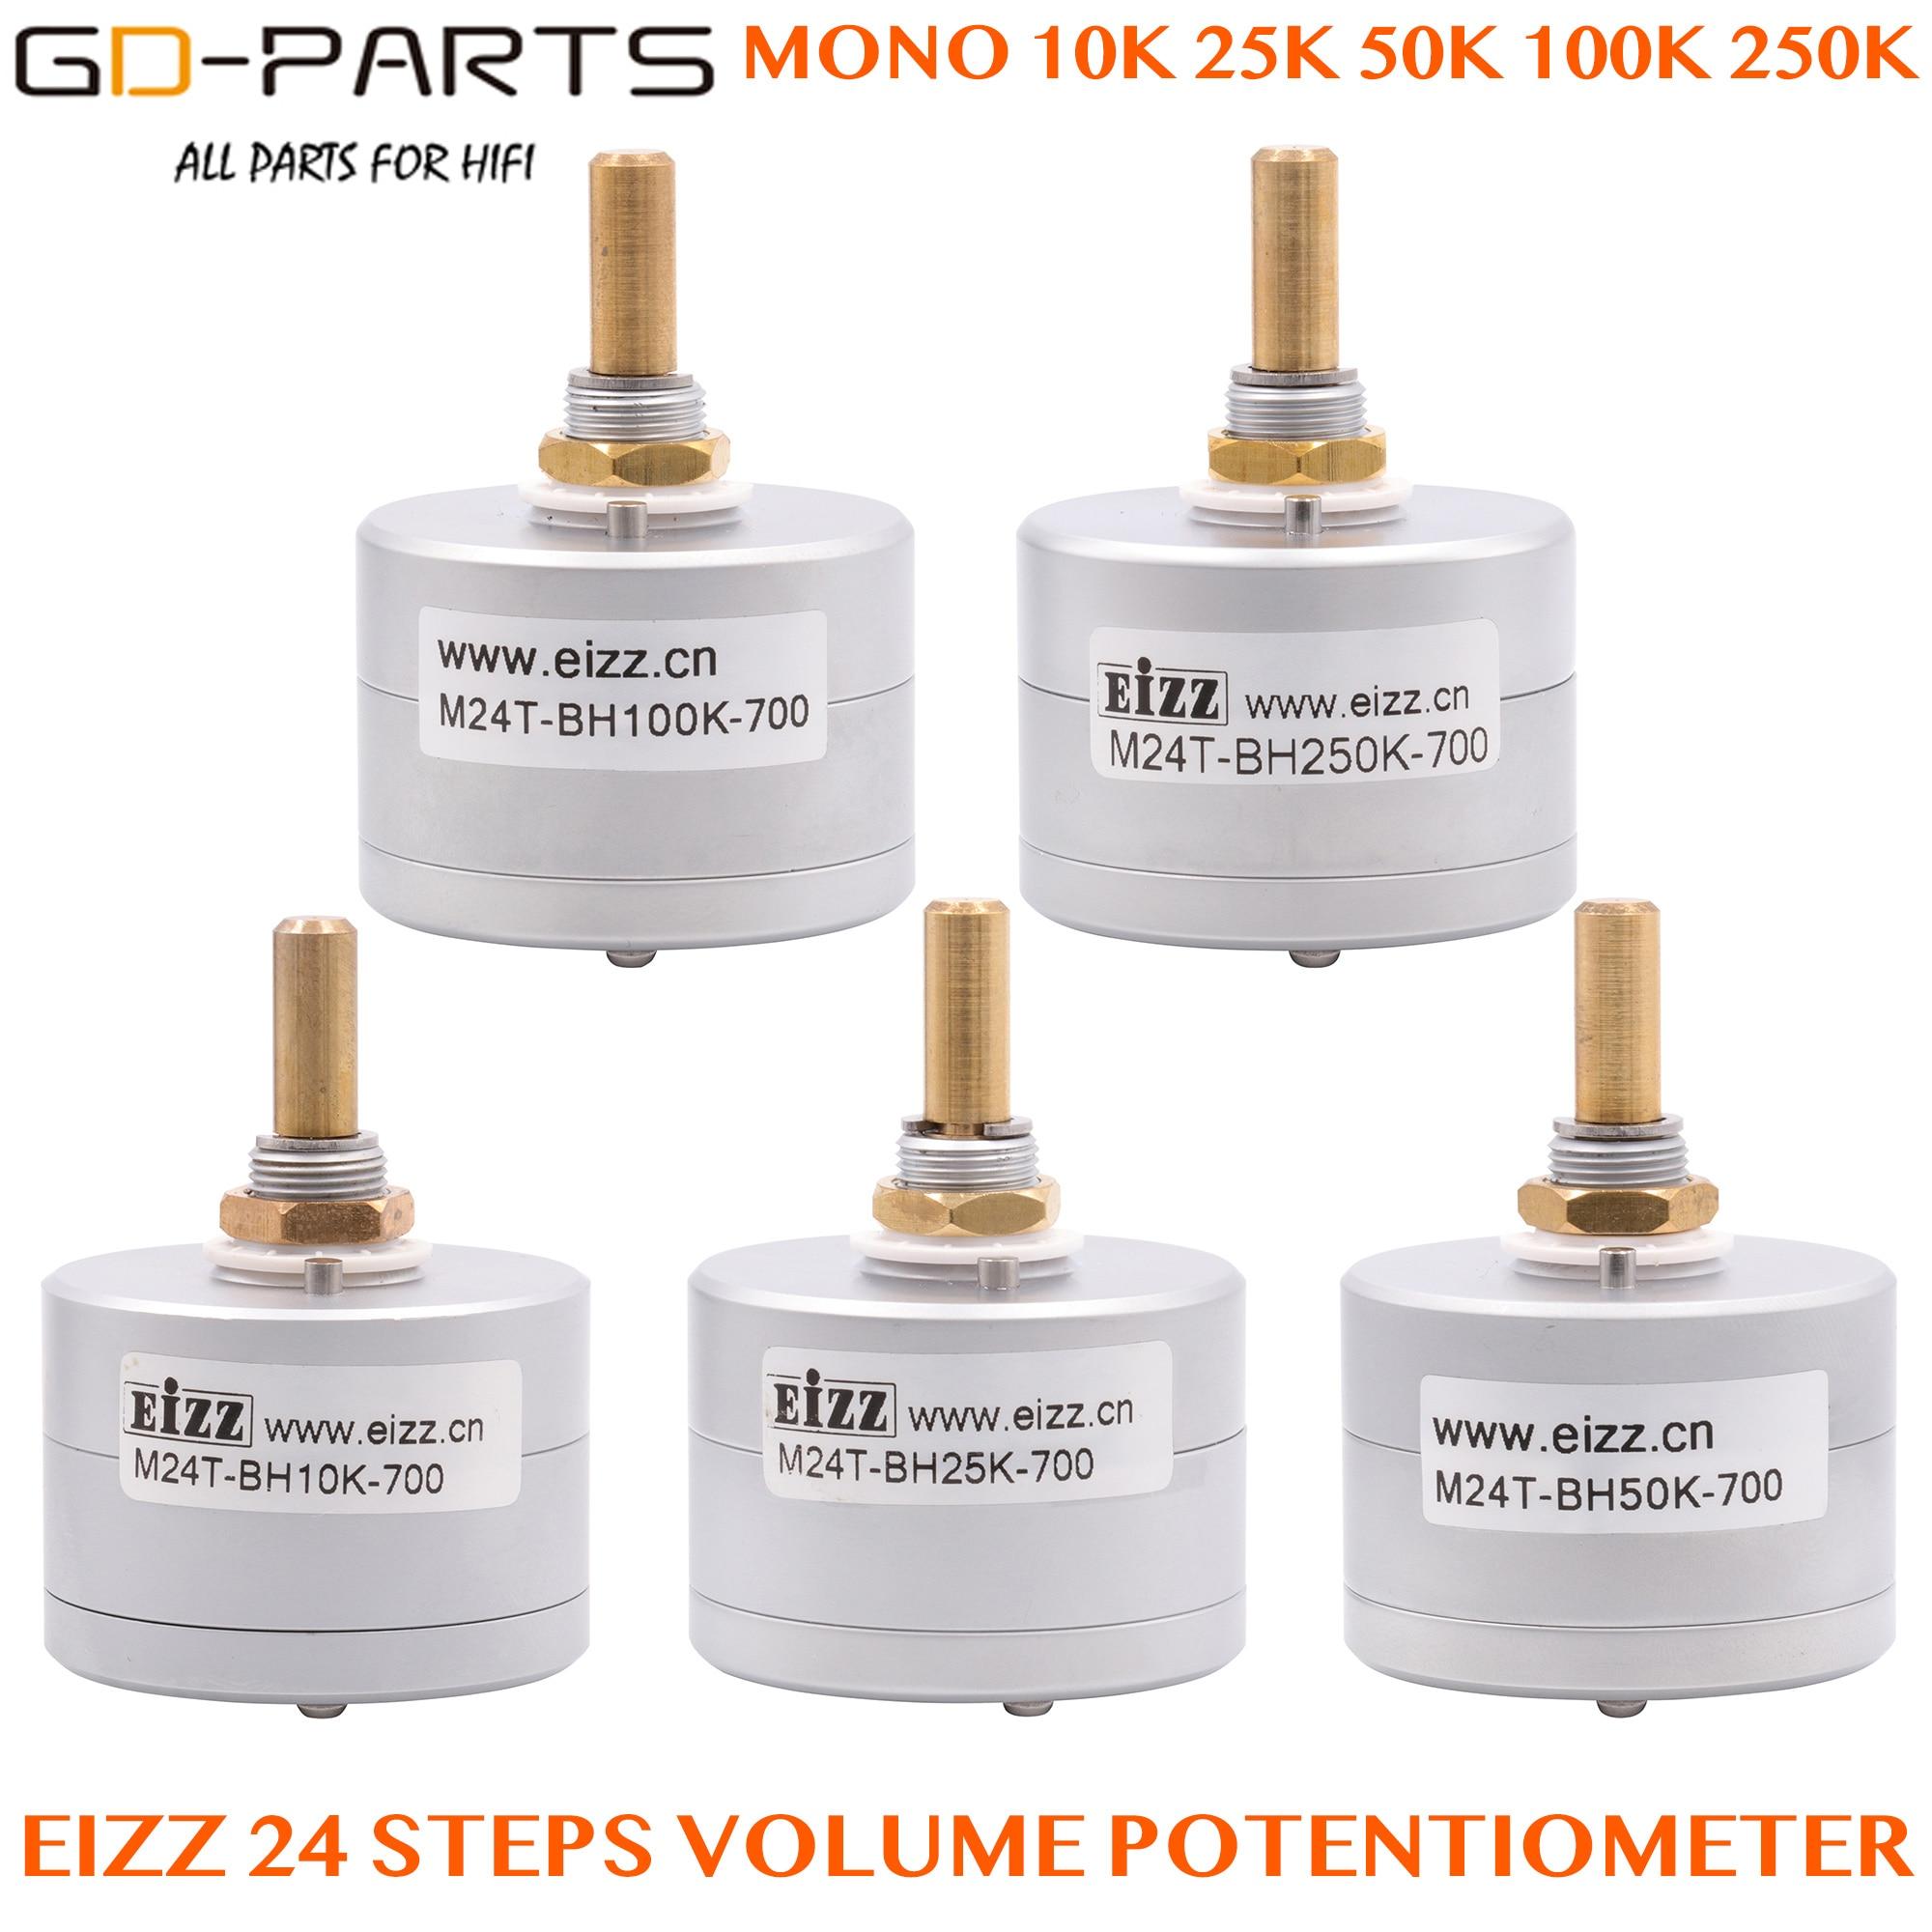 EIZZ Mono 10K 25K 50K 100K 250K 24 шага потенциометра громкости лог шаговый аттенюатор серийный тип 6 мм латунный вал Hifi DIY 1 шт.